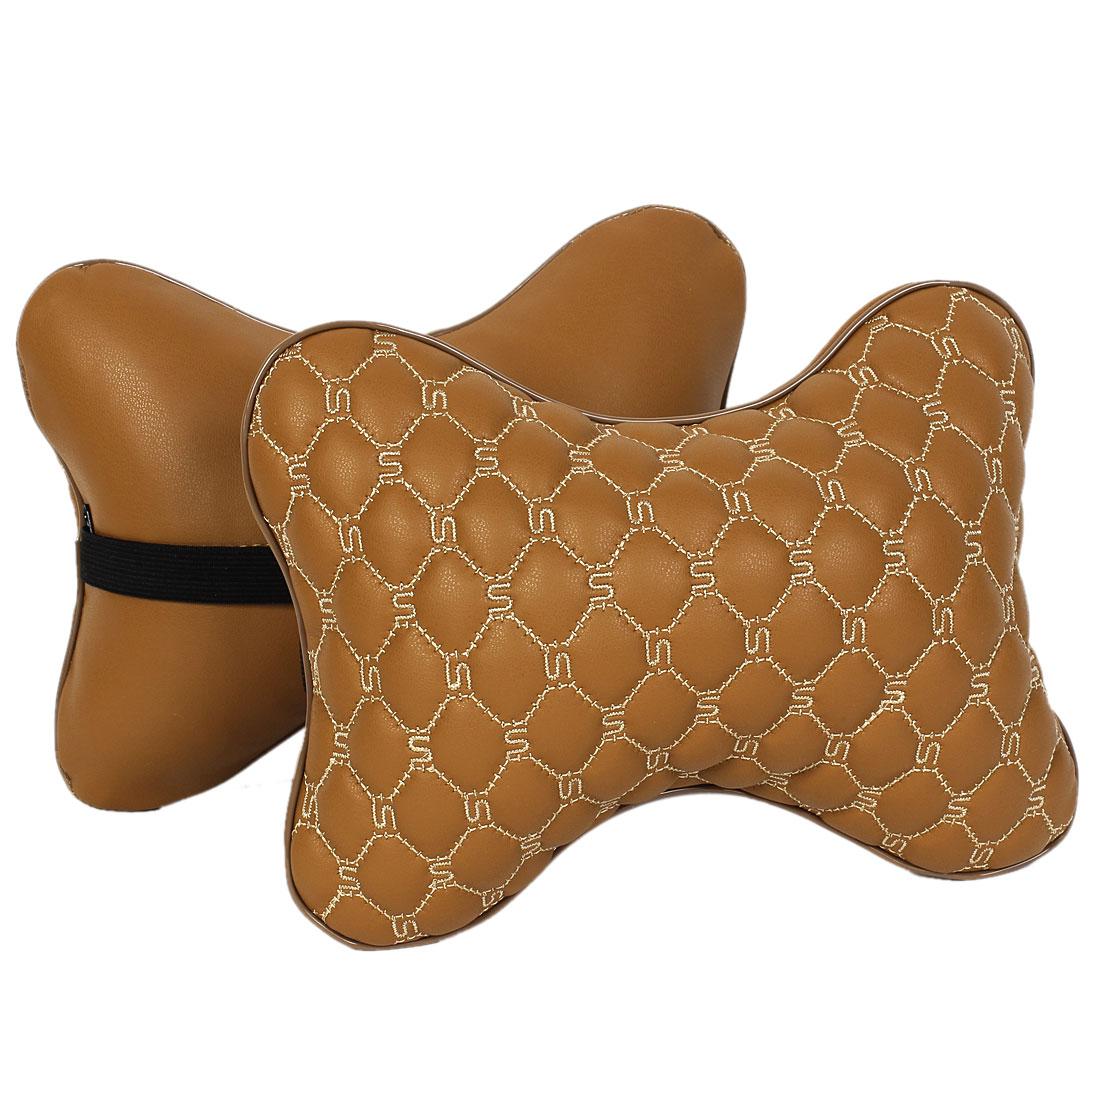 2 Pcs Brown Bone Shape Seat Head Neck Rest Cushion Headrest Pillow Pad for Car